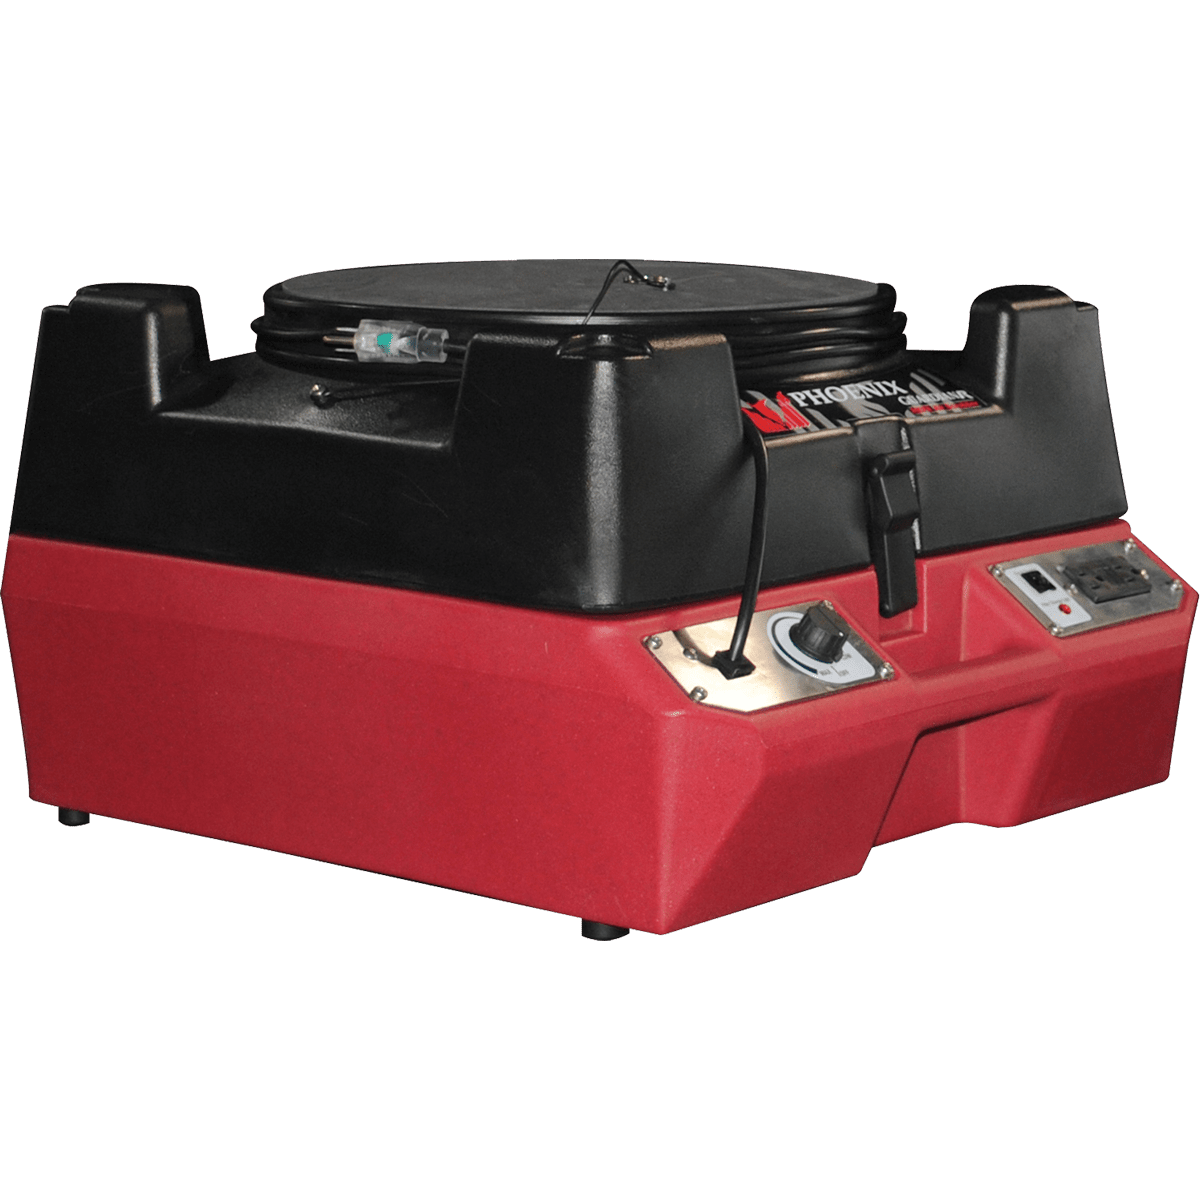 Phoenix GuardianR Pro 500 CFM HEPA Air Scrubber System